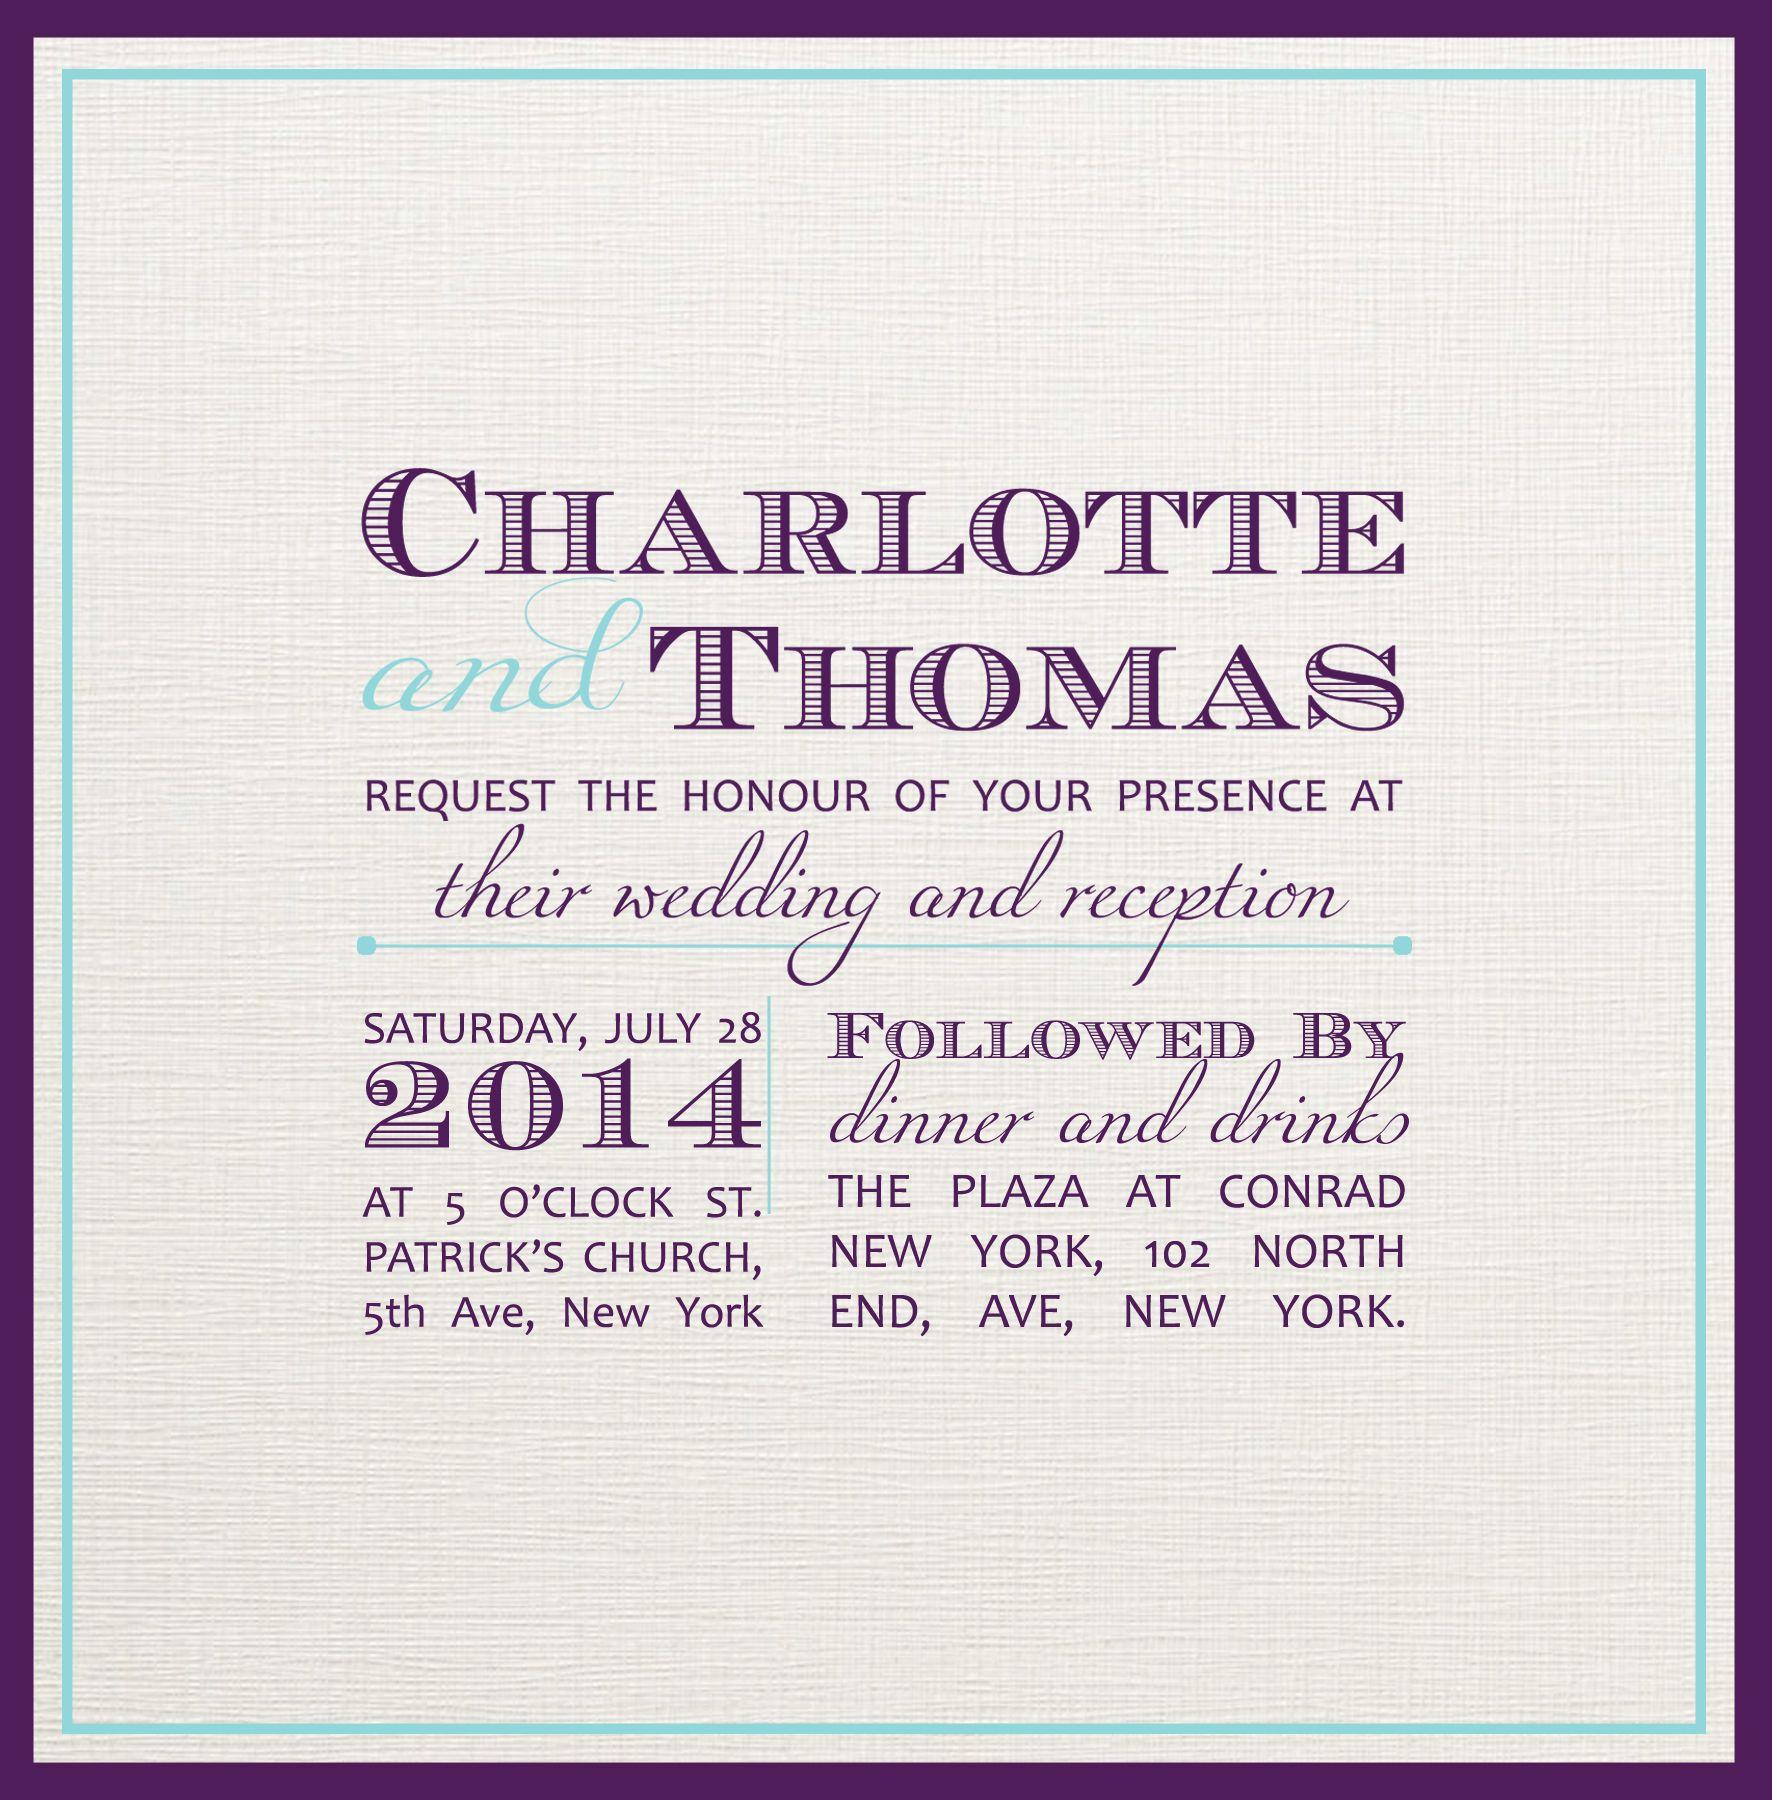 Wedding Invitation. Fonts Used- Candara, Miama & Ecuyer DAX | My ...